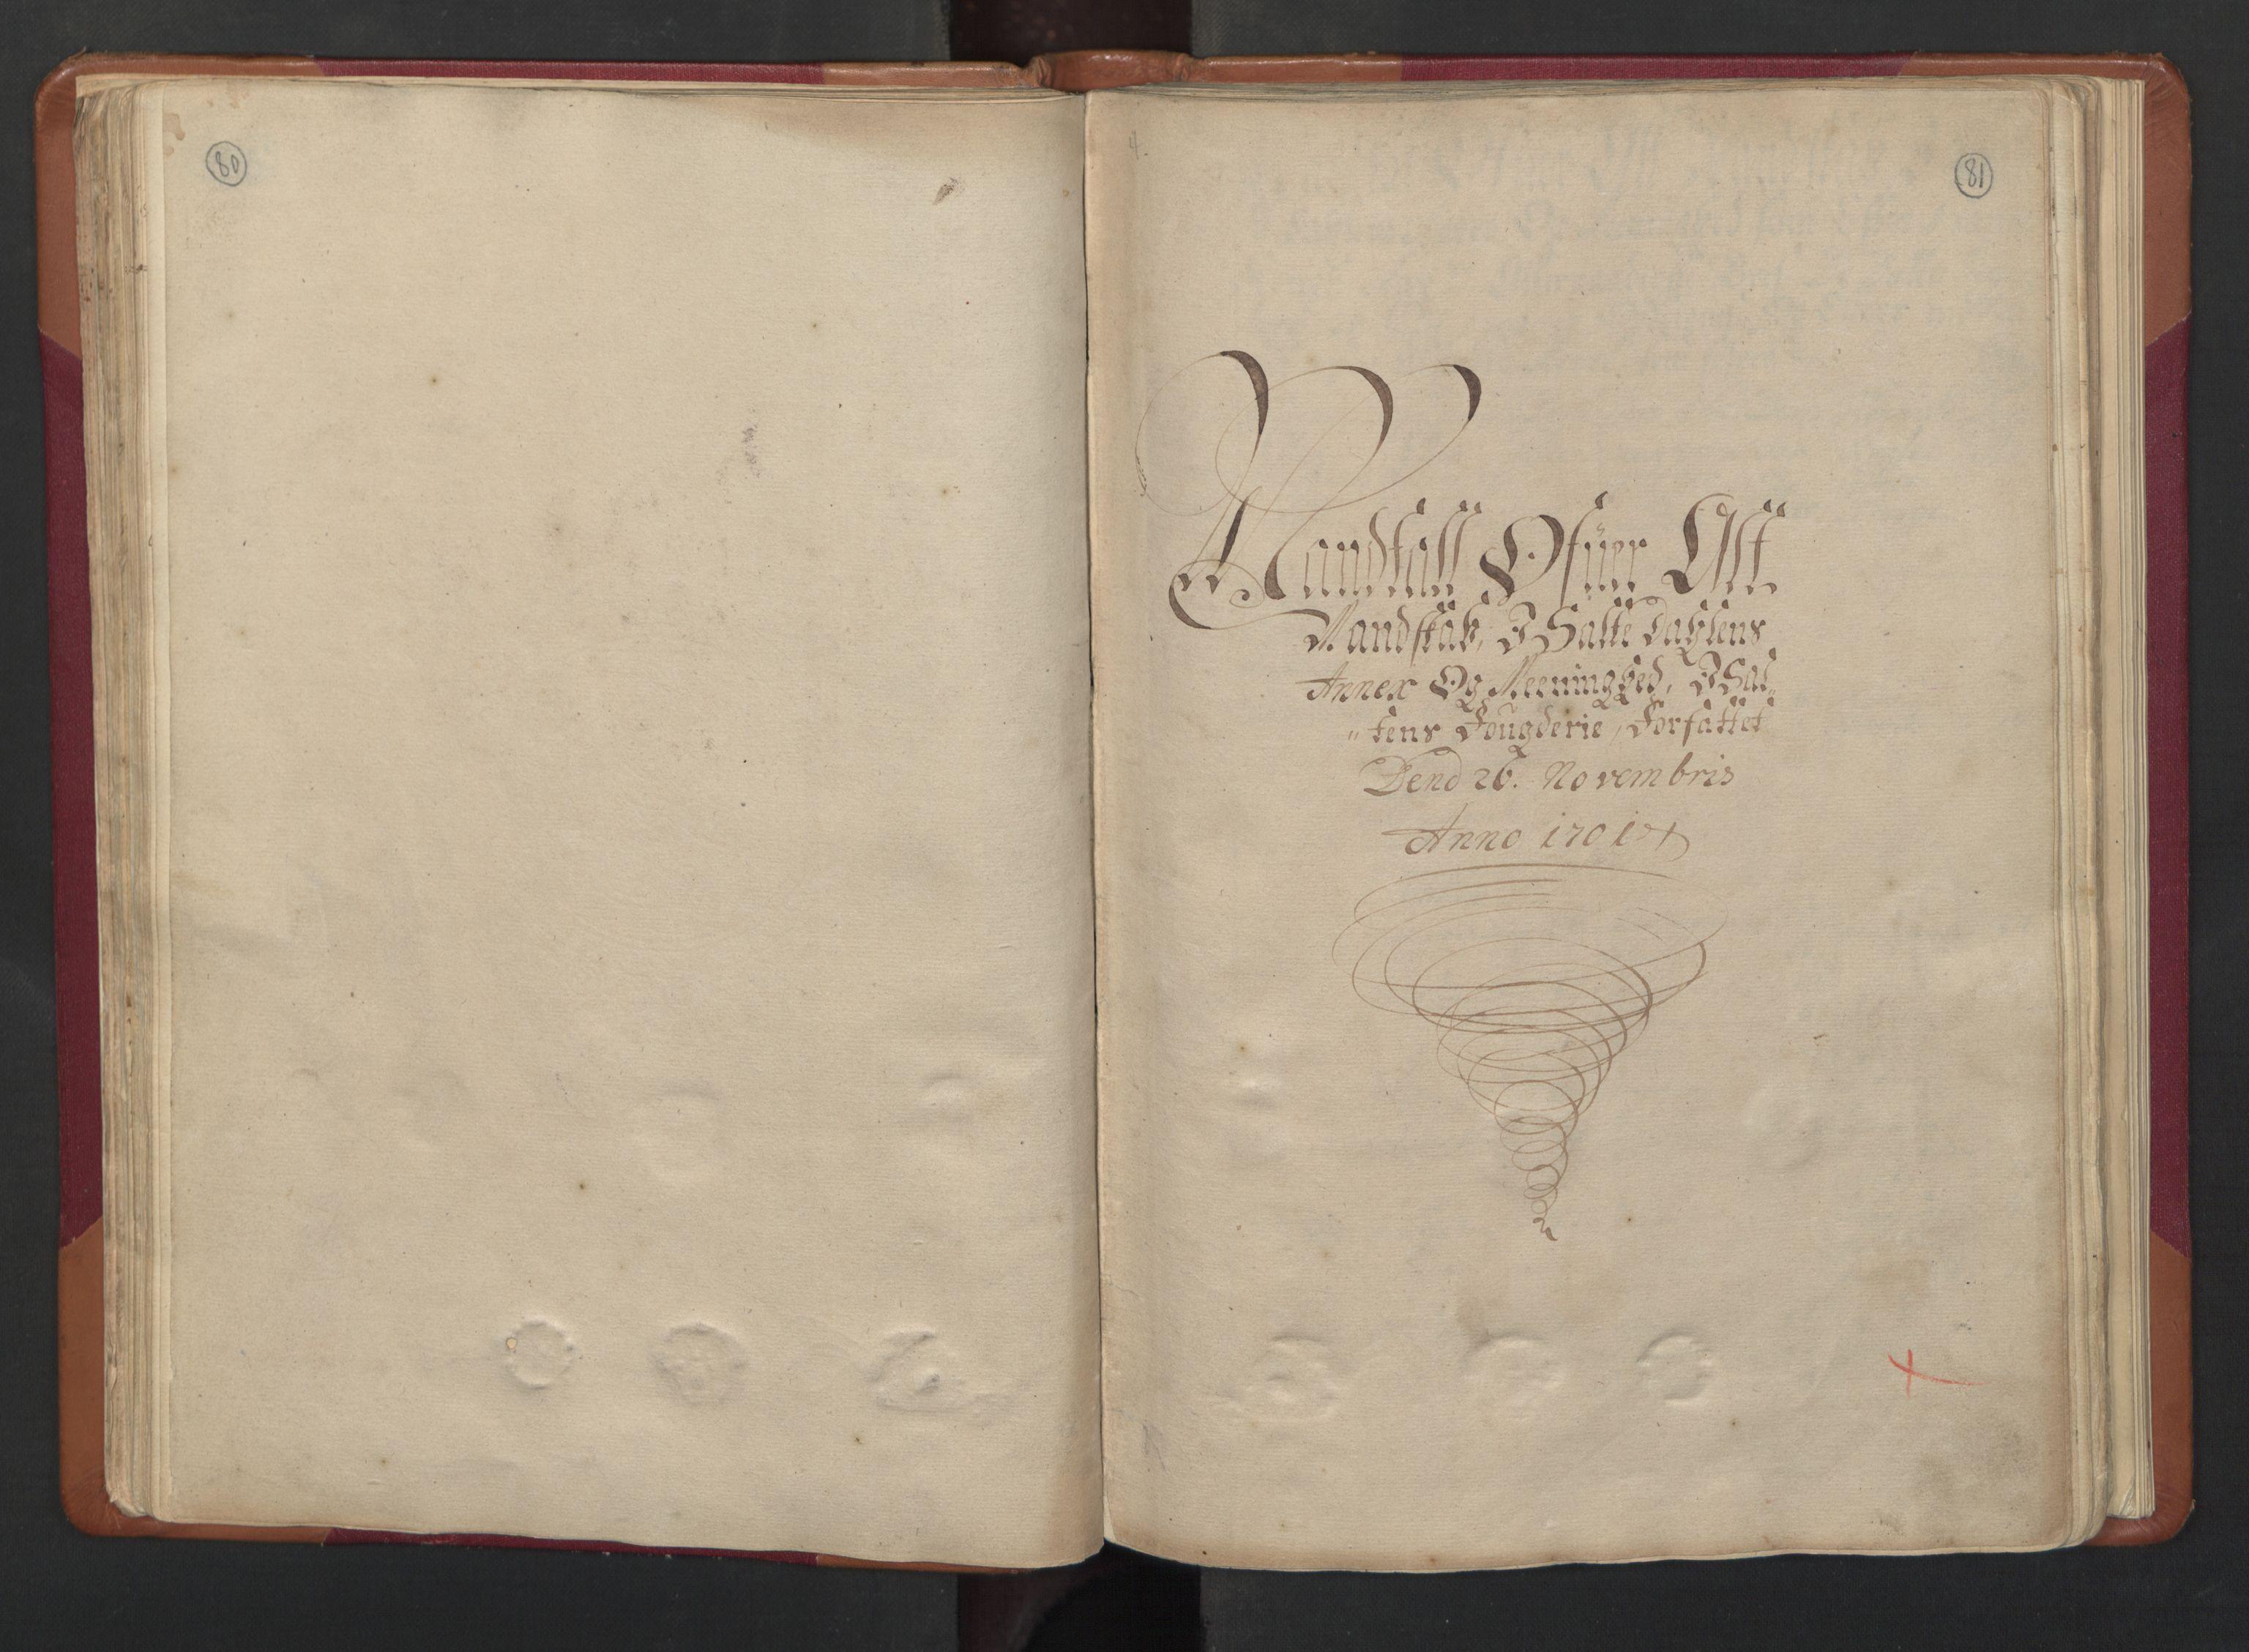 RA, Manntallet 1701, nr. 17: Salten fogderi, 1701, s. 80-81